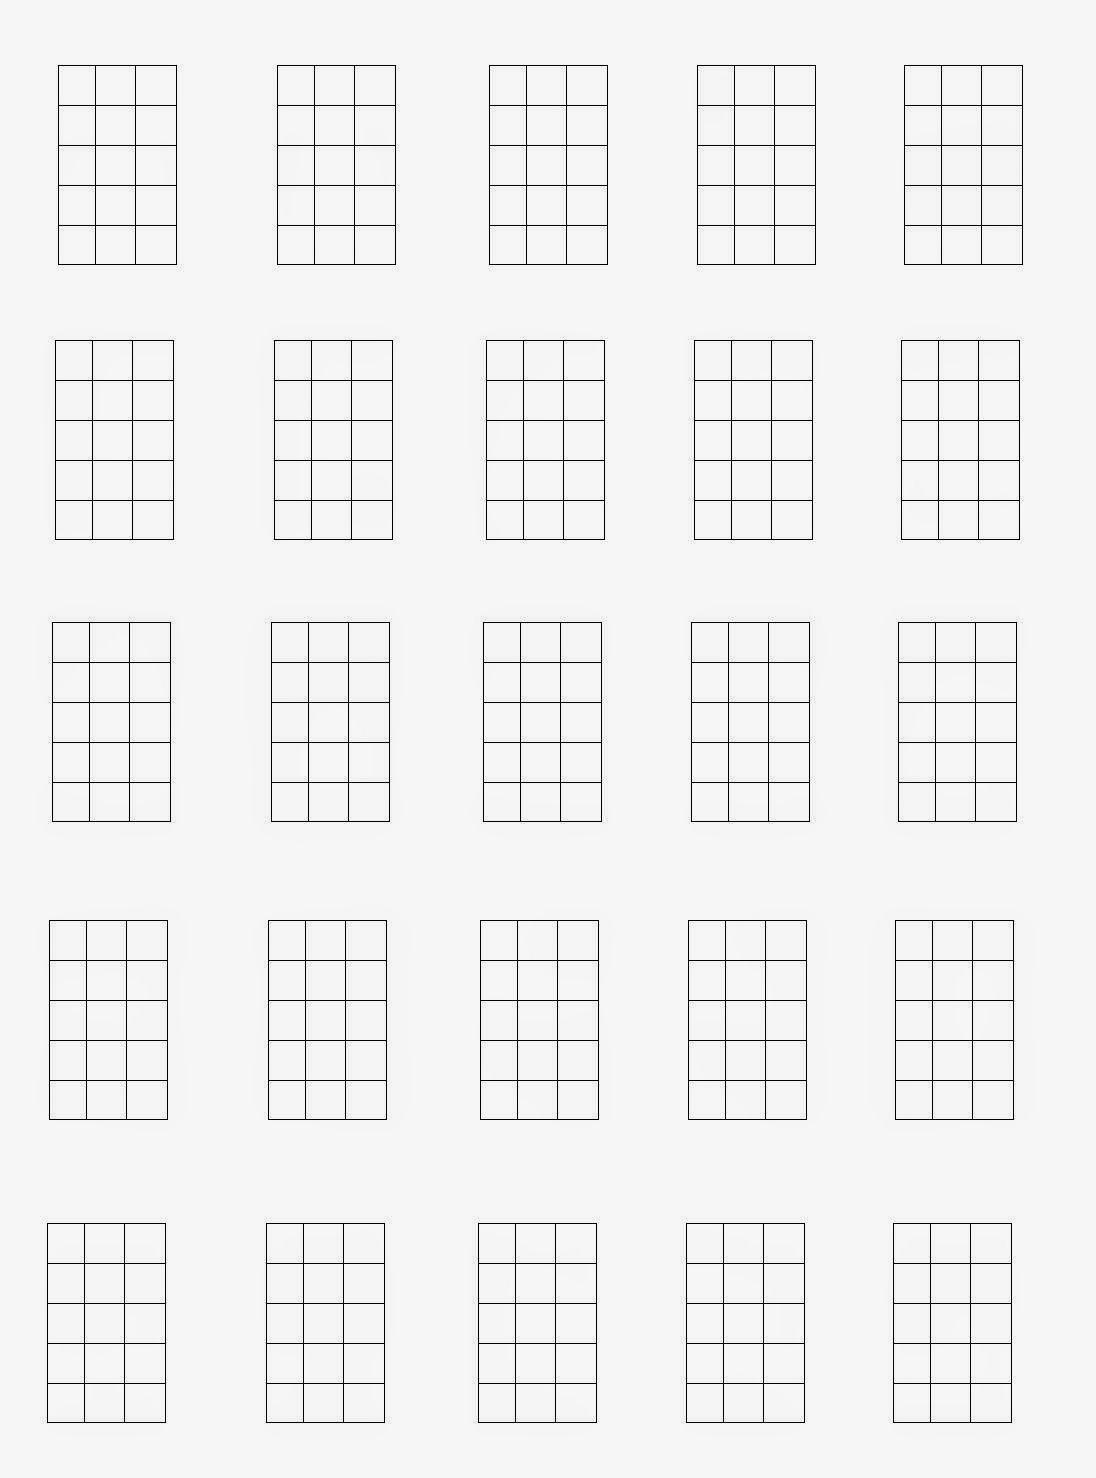 Image Result For Blank Ukulele Neck Diagram Ukulele Chords In 2018